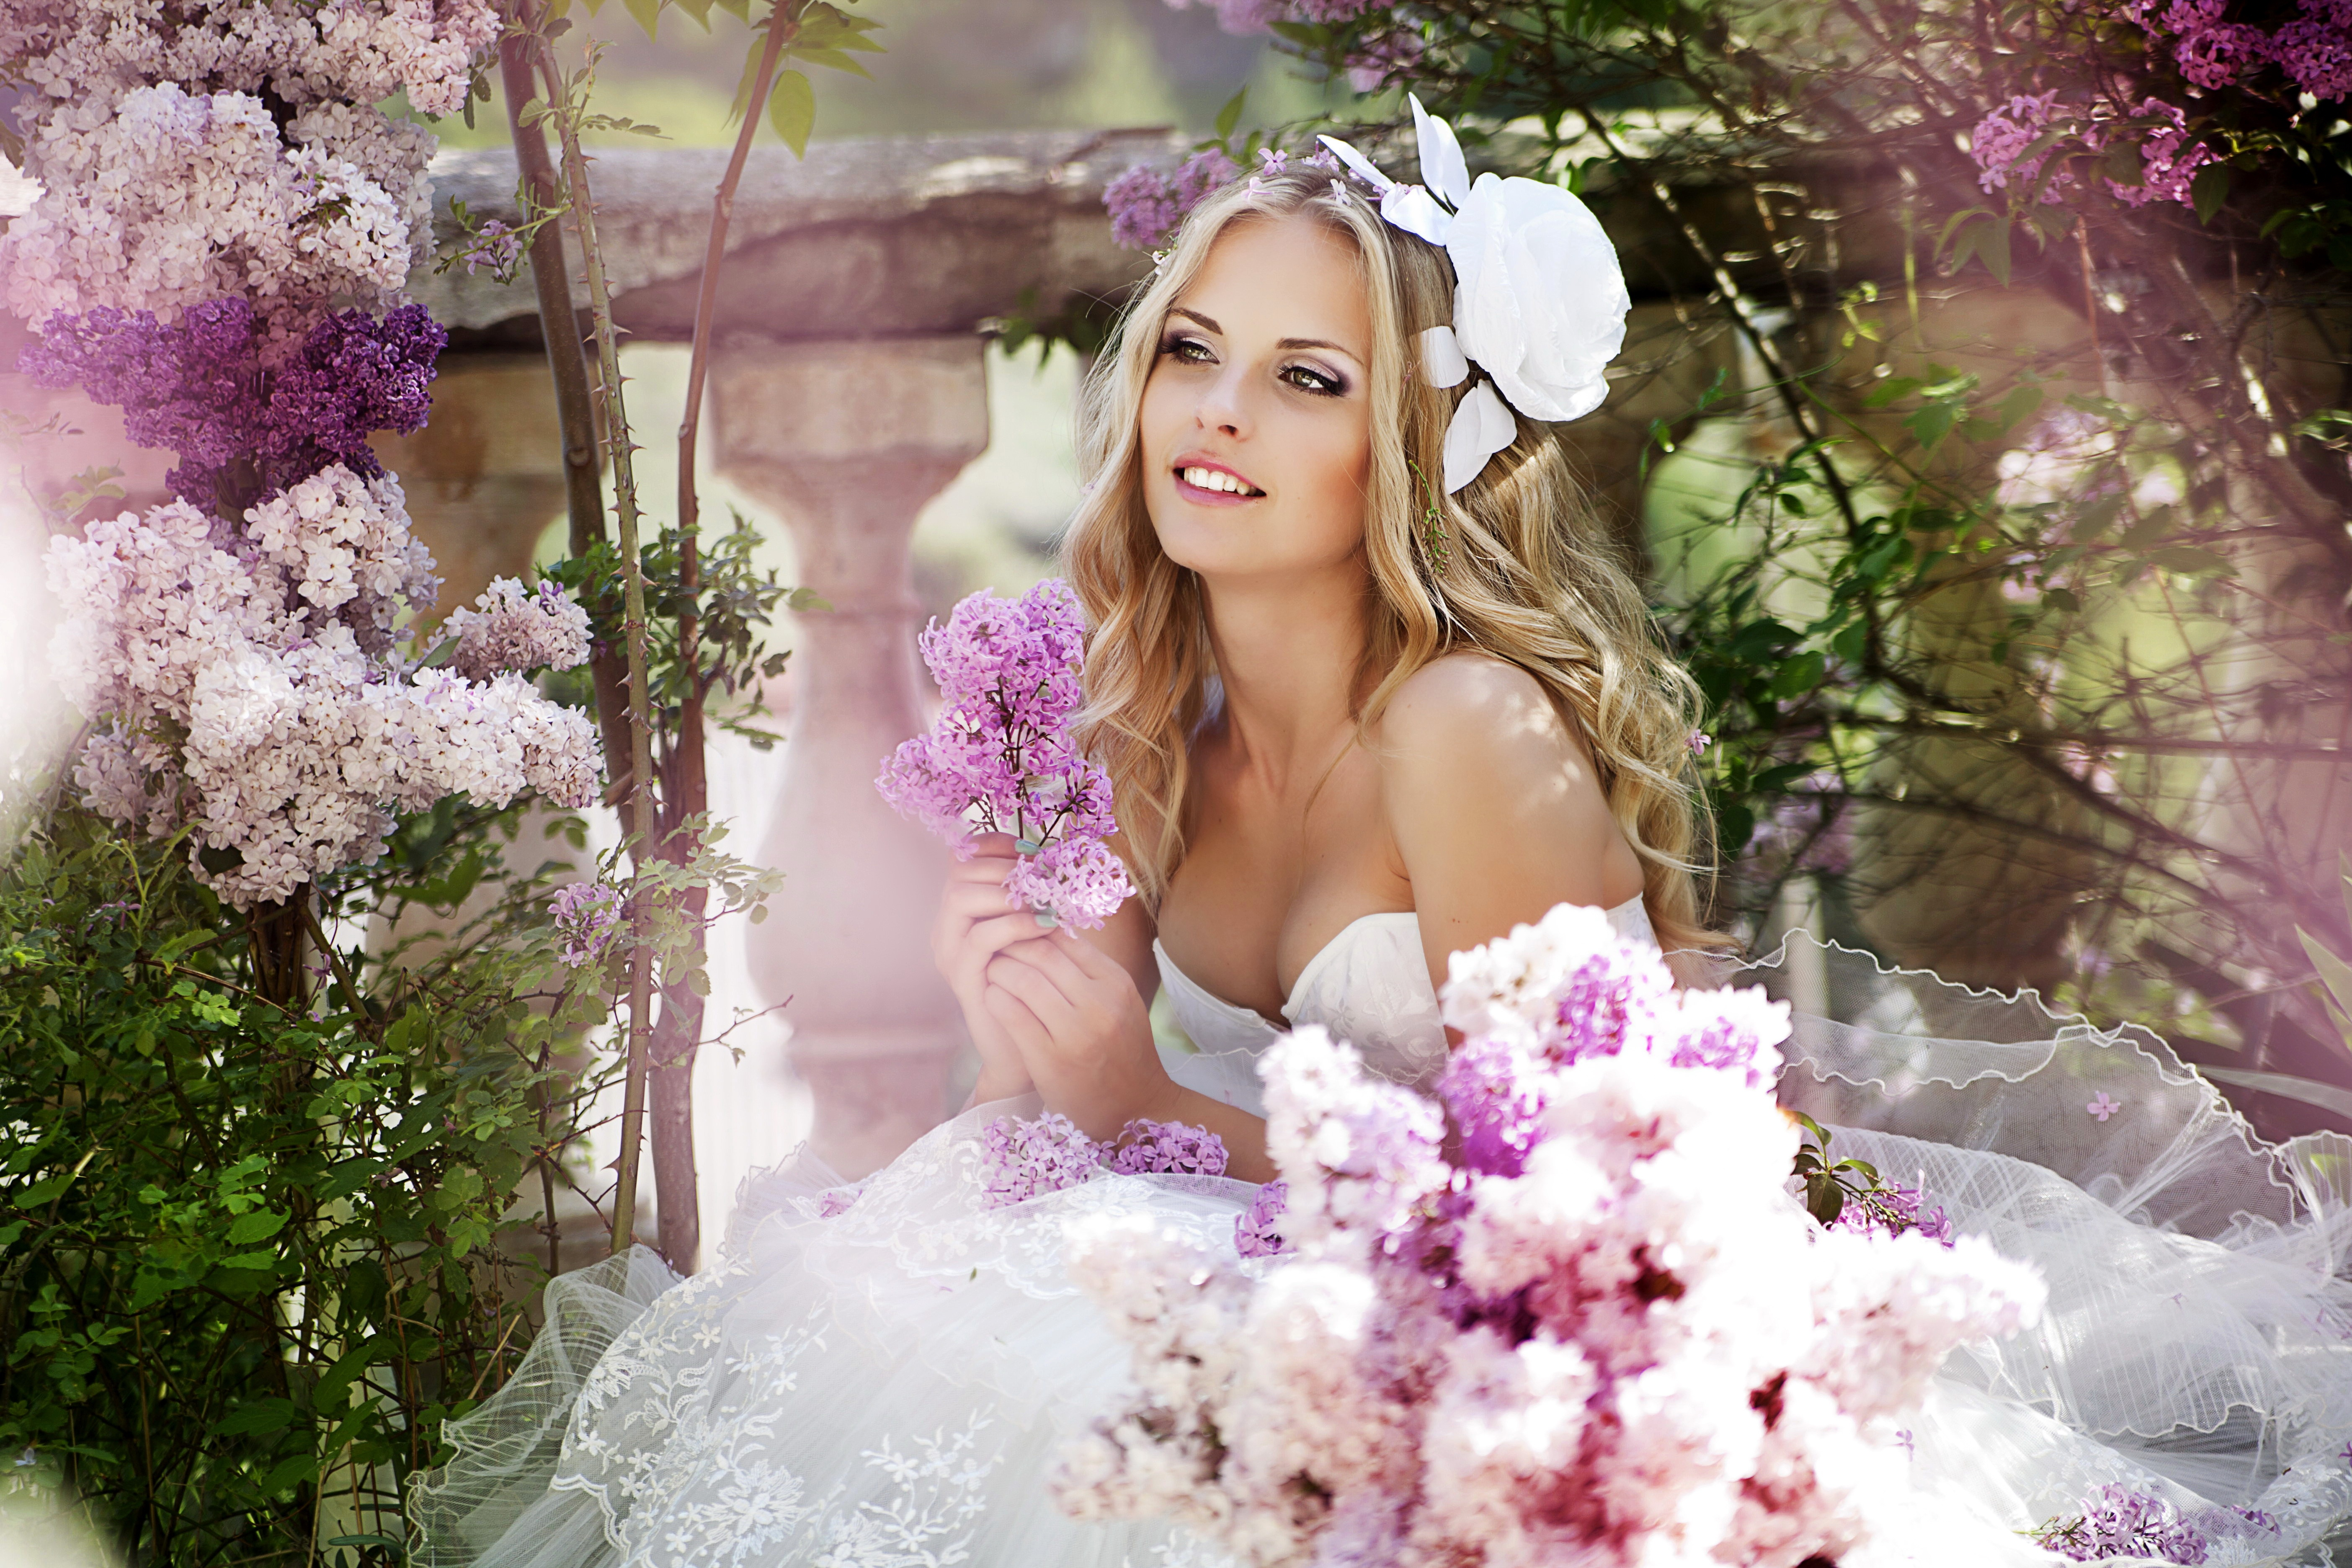 невеста  № 57981 без смс